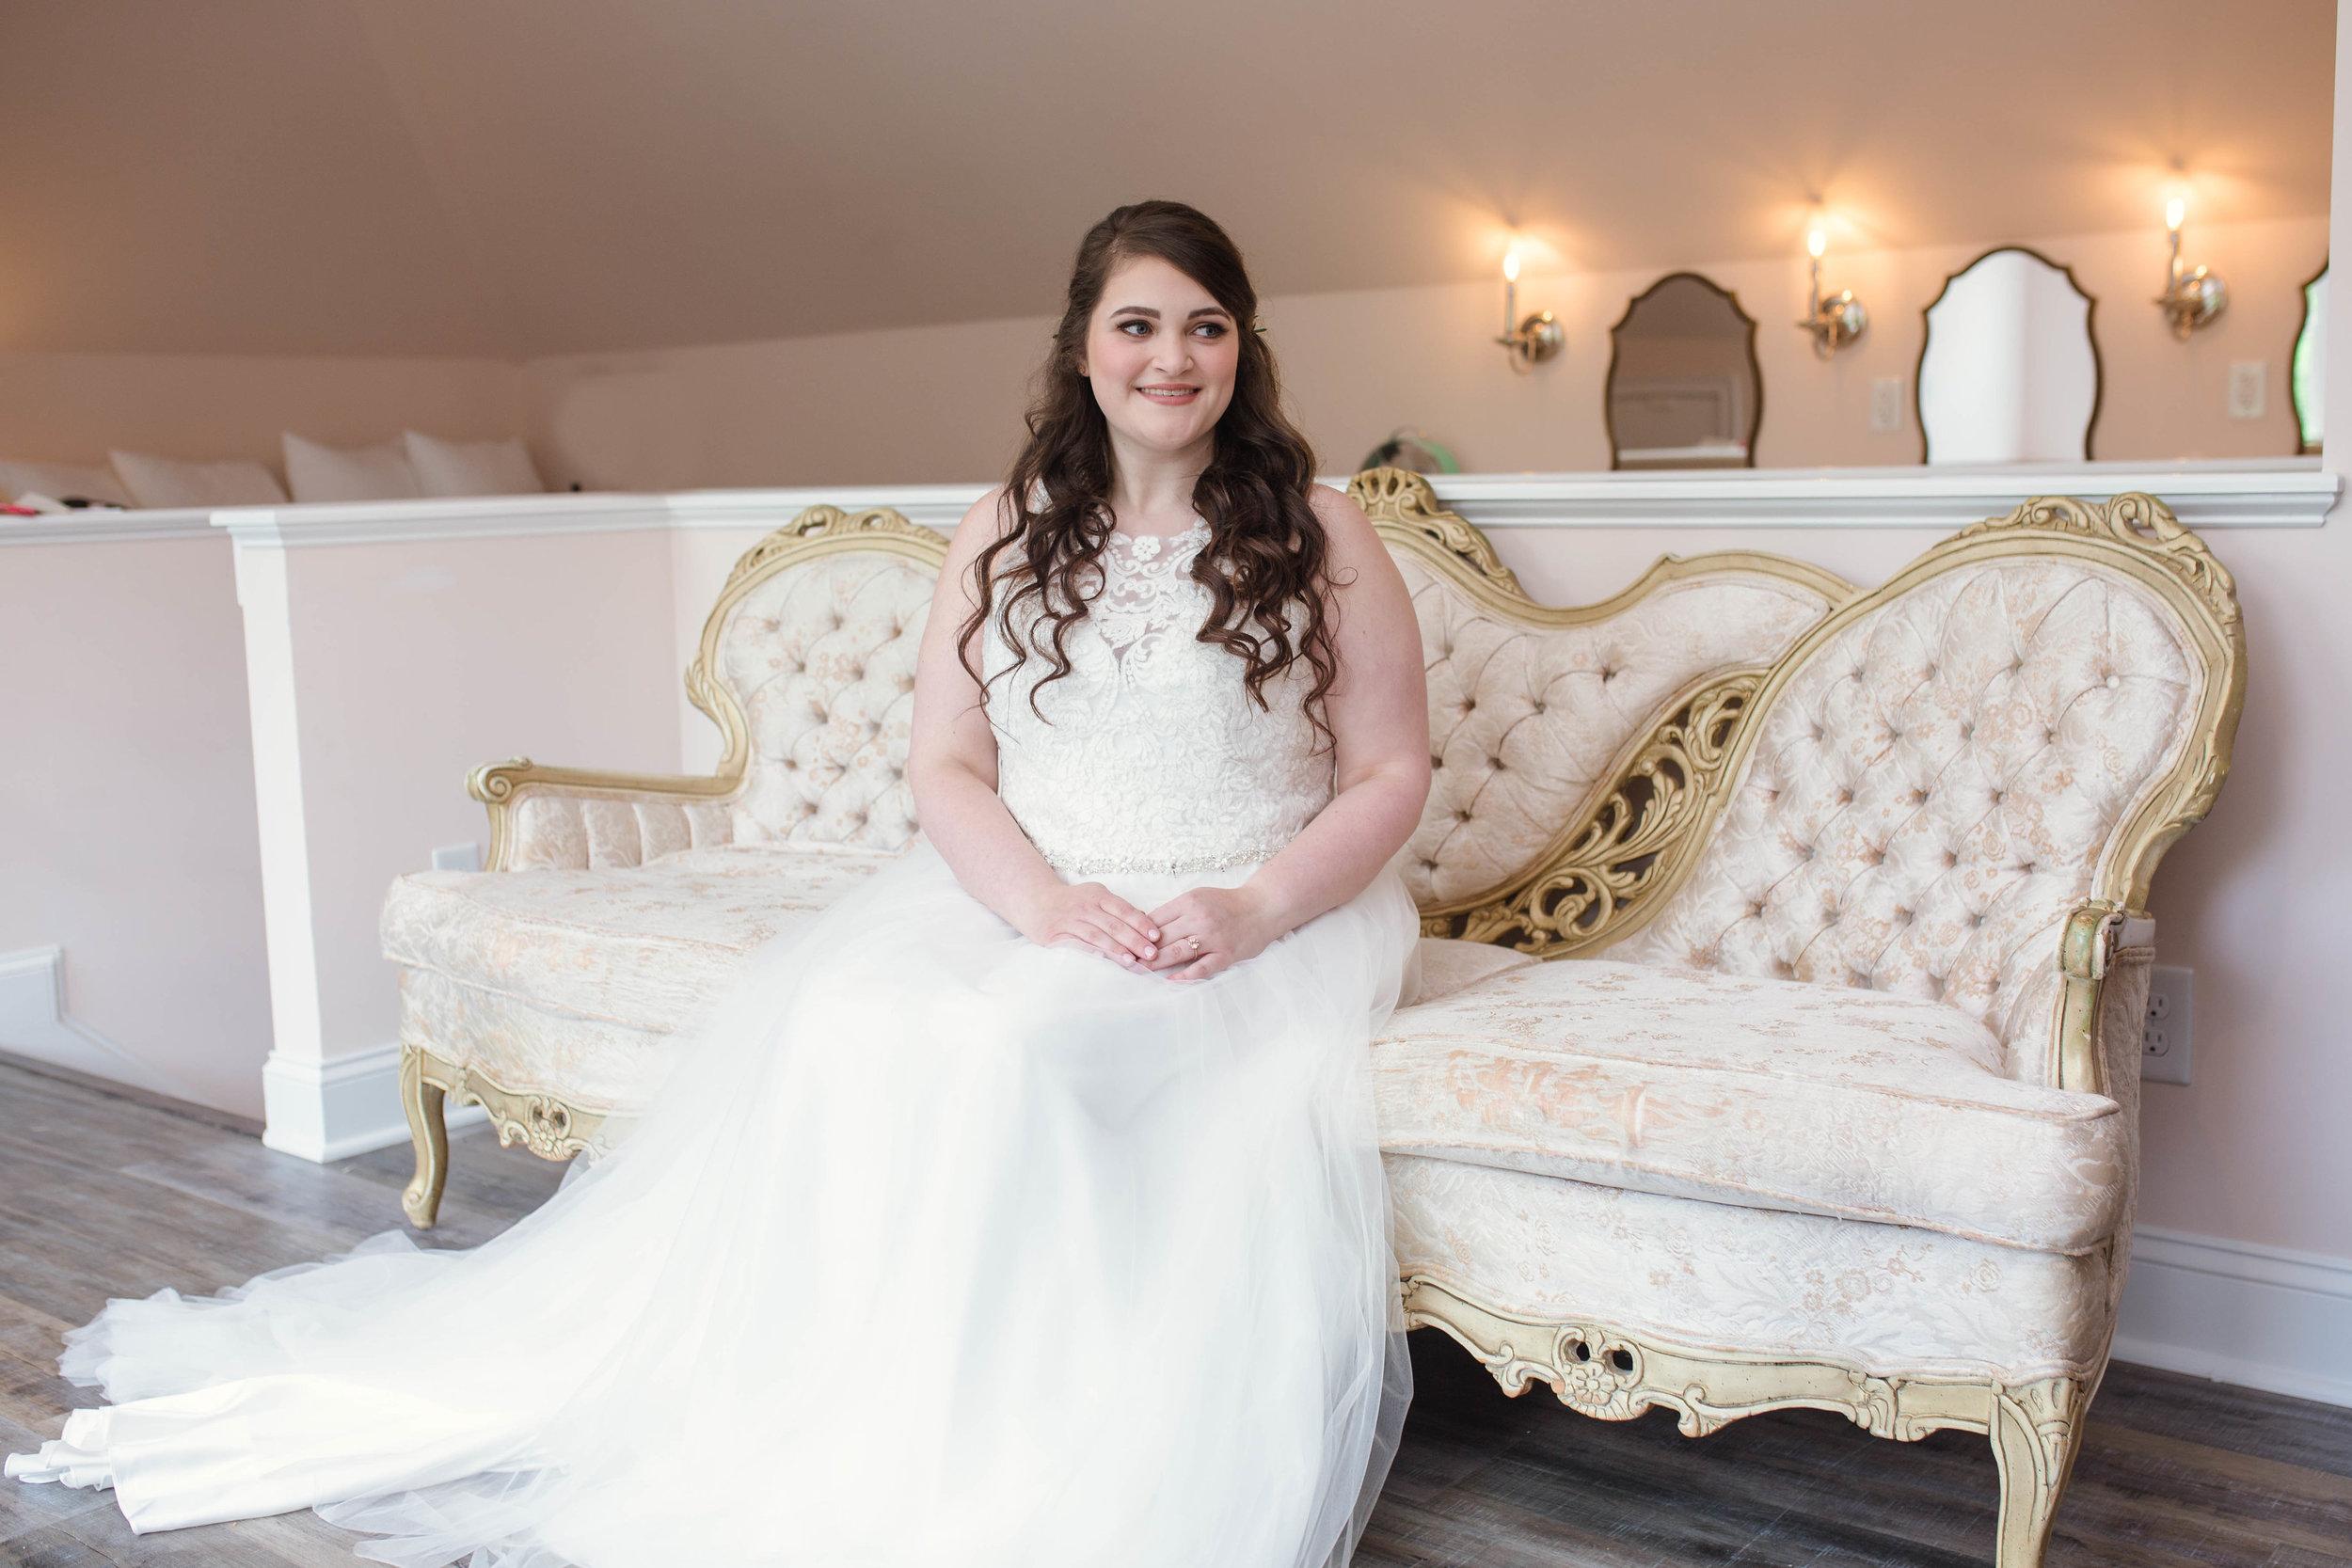 Bridal Suite + Getting Ready Tips - Honolulu Oahu Hawaii Wedding Photographer